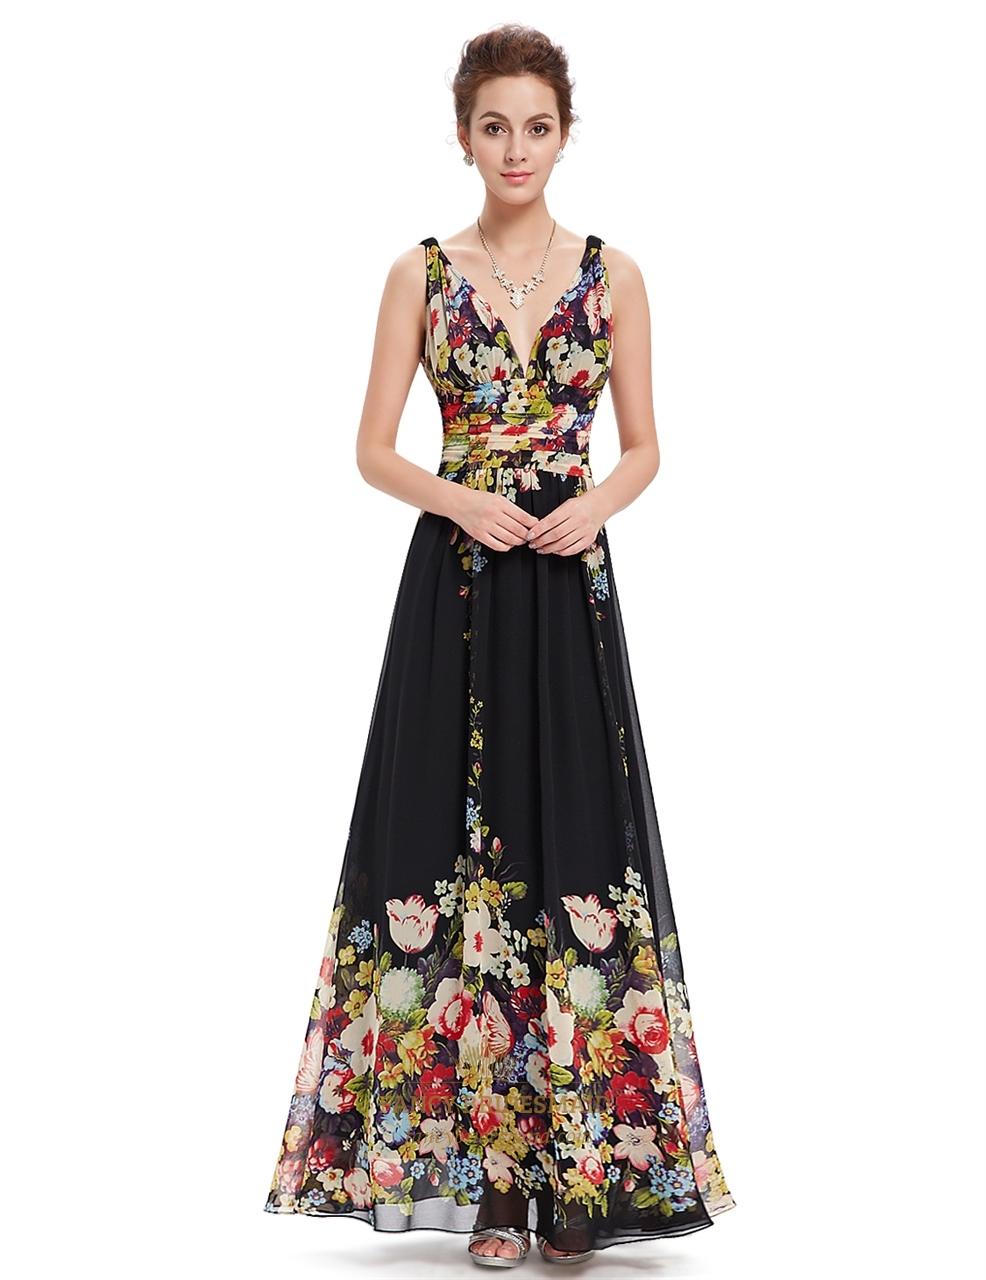 aa4f42a72f5 Black Deep V-Neck Floral Print Long Chiffon Prom Dresses SKU -NW1634